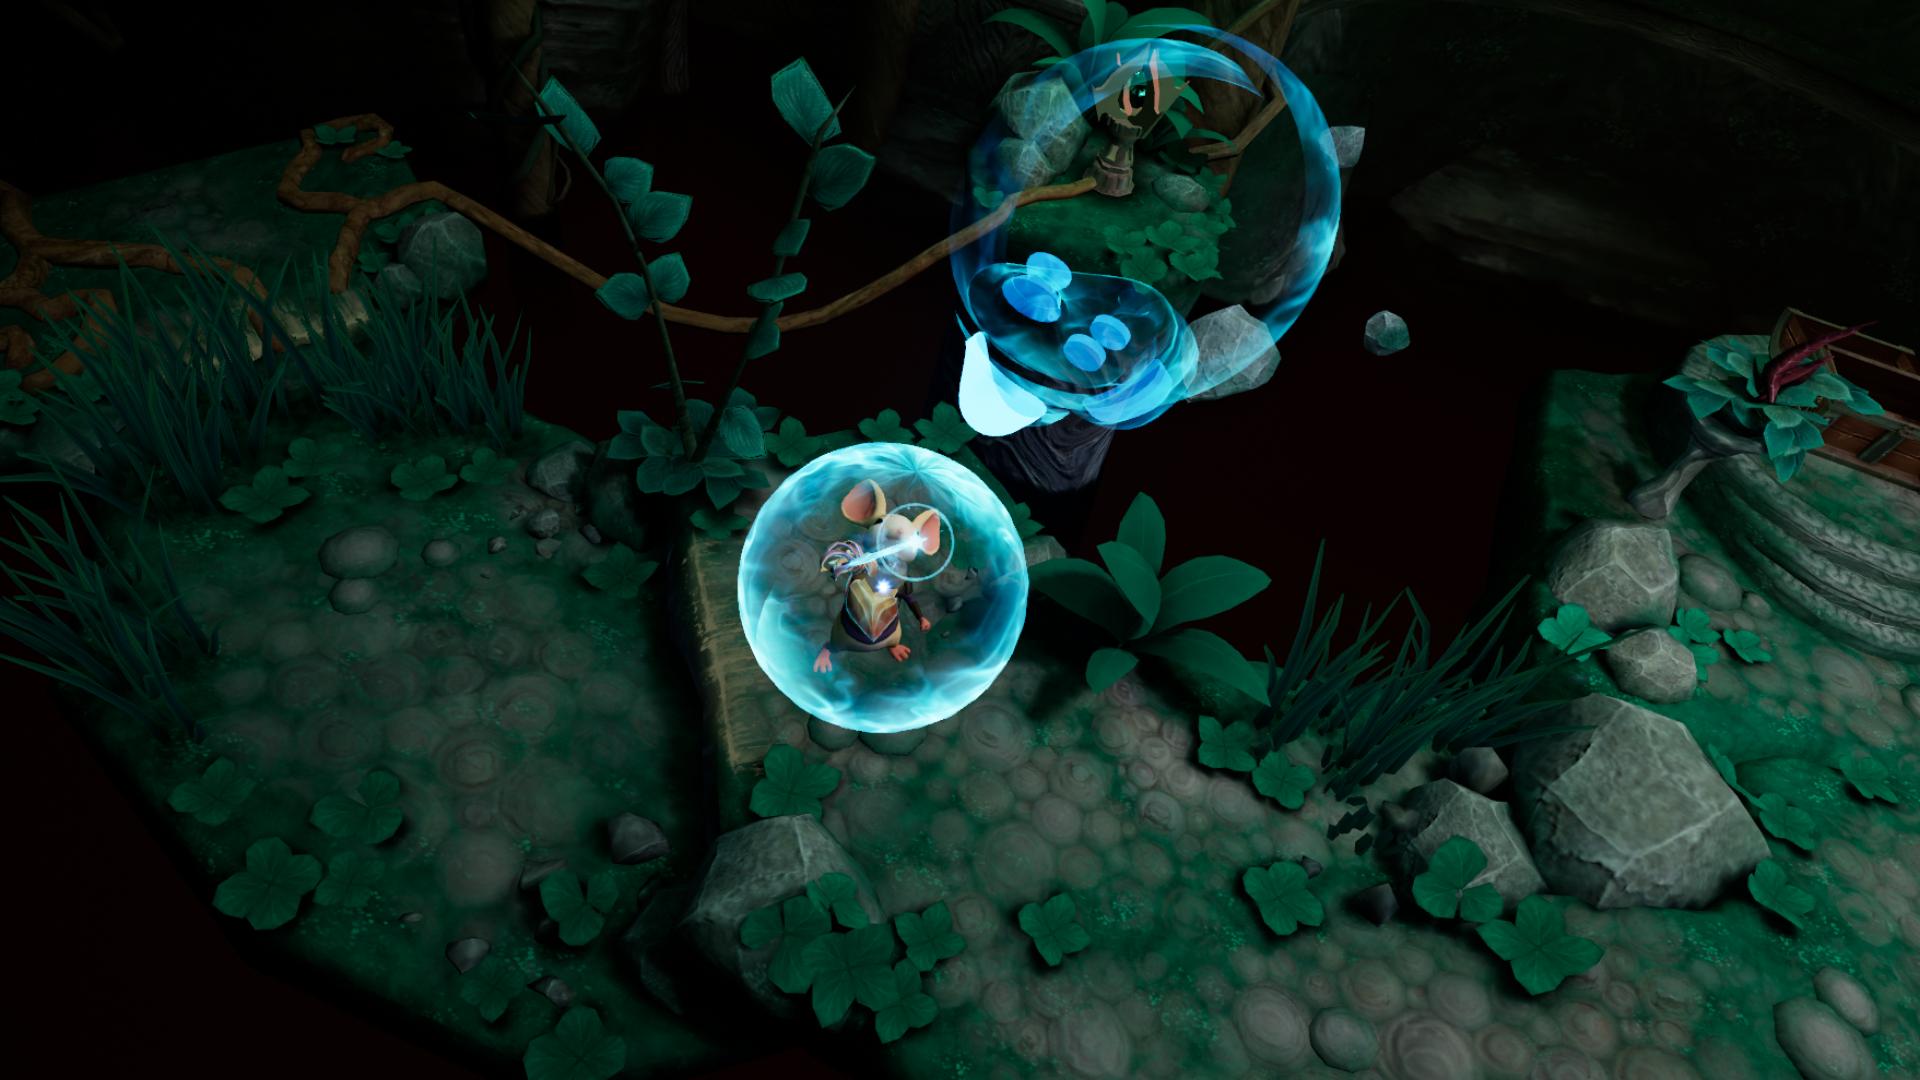 VRゲーム【Moss】自分のポジション設定がしっくりくる2